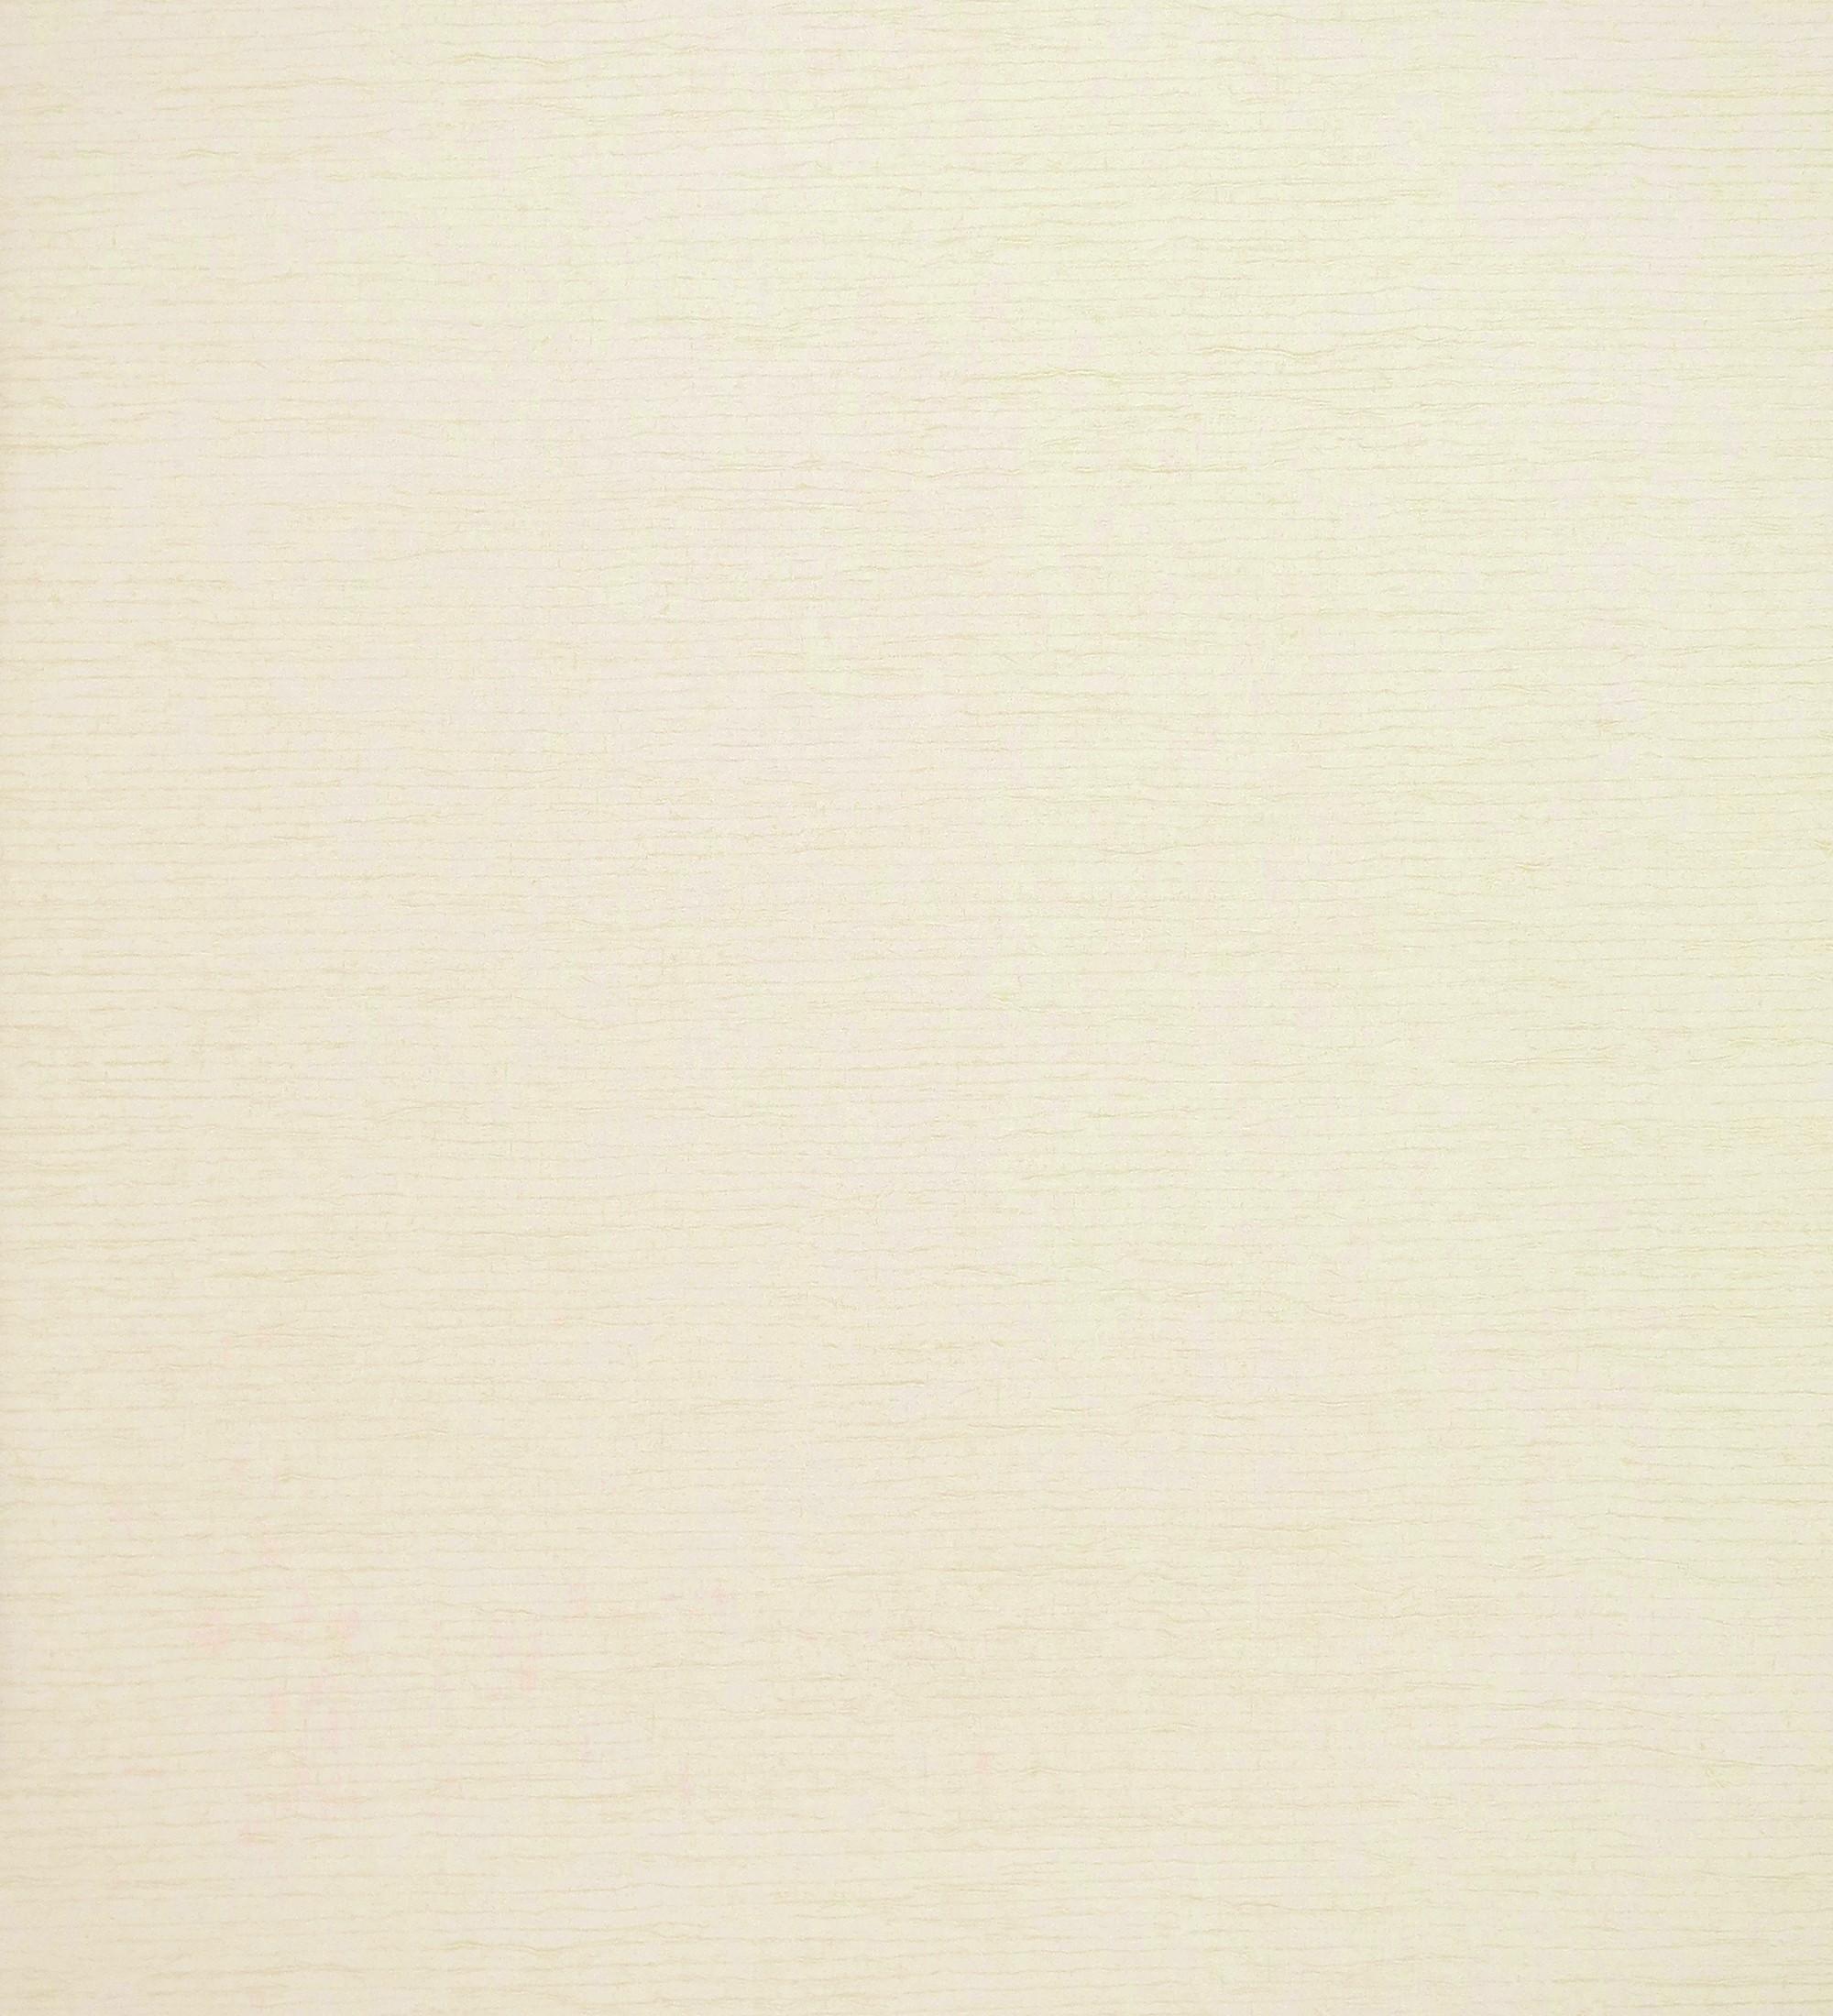 Papel pintado online ofertas beautiful papel pintado de for Papel pintado oferta